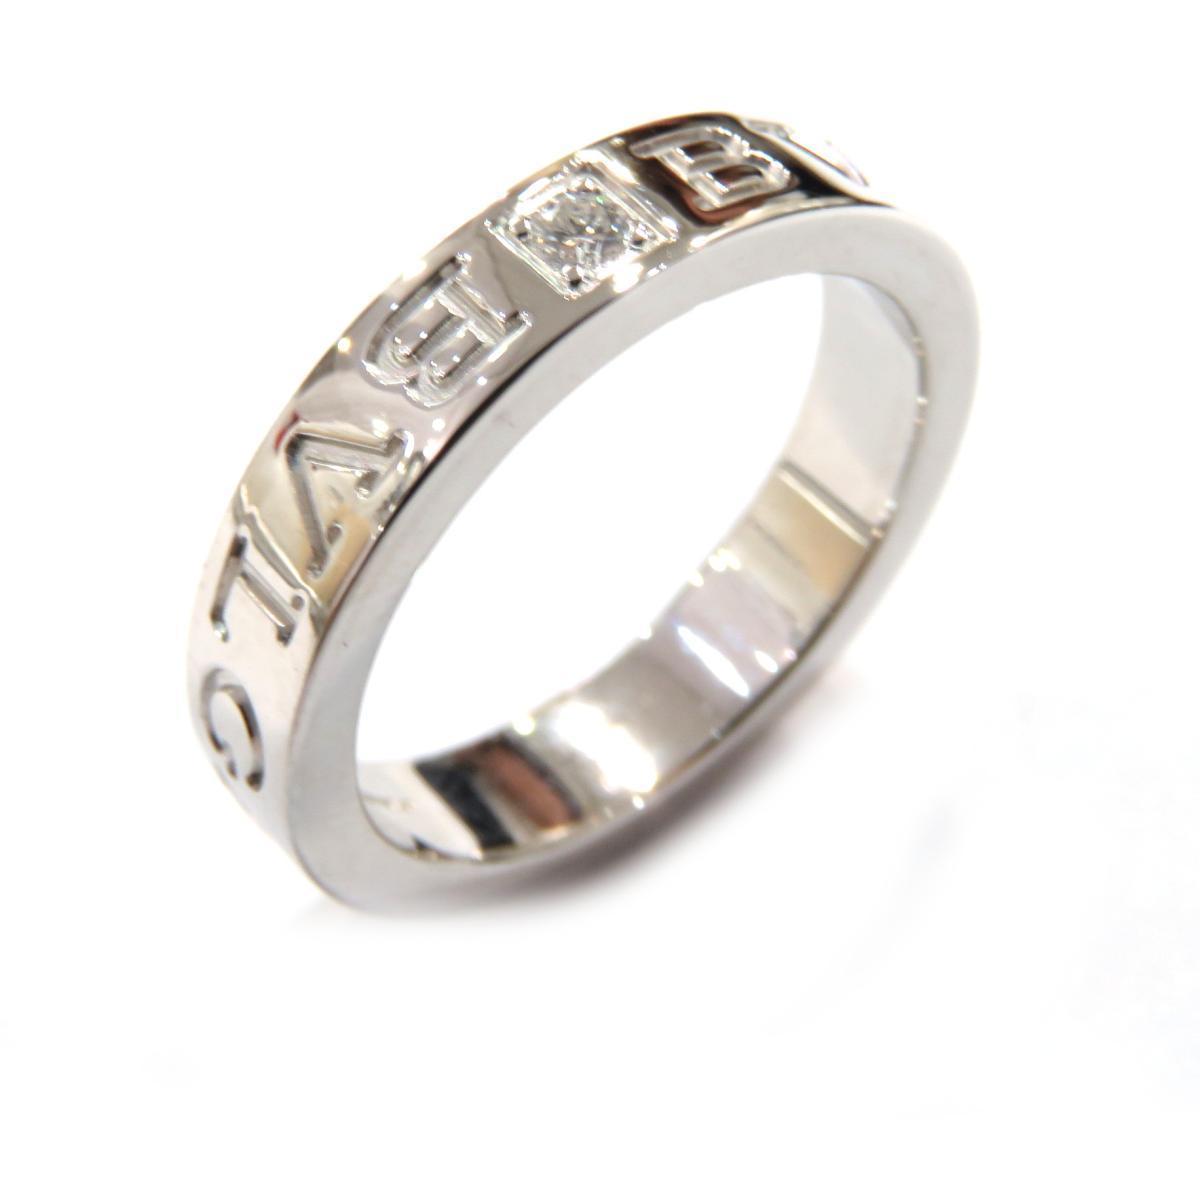 BVLGARI double 1PD ring ladies K18WG (750) diamond 11.5